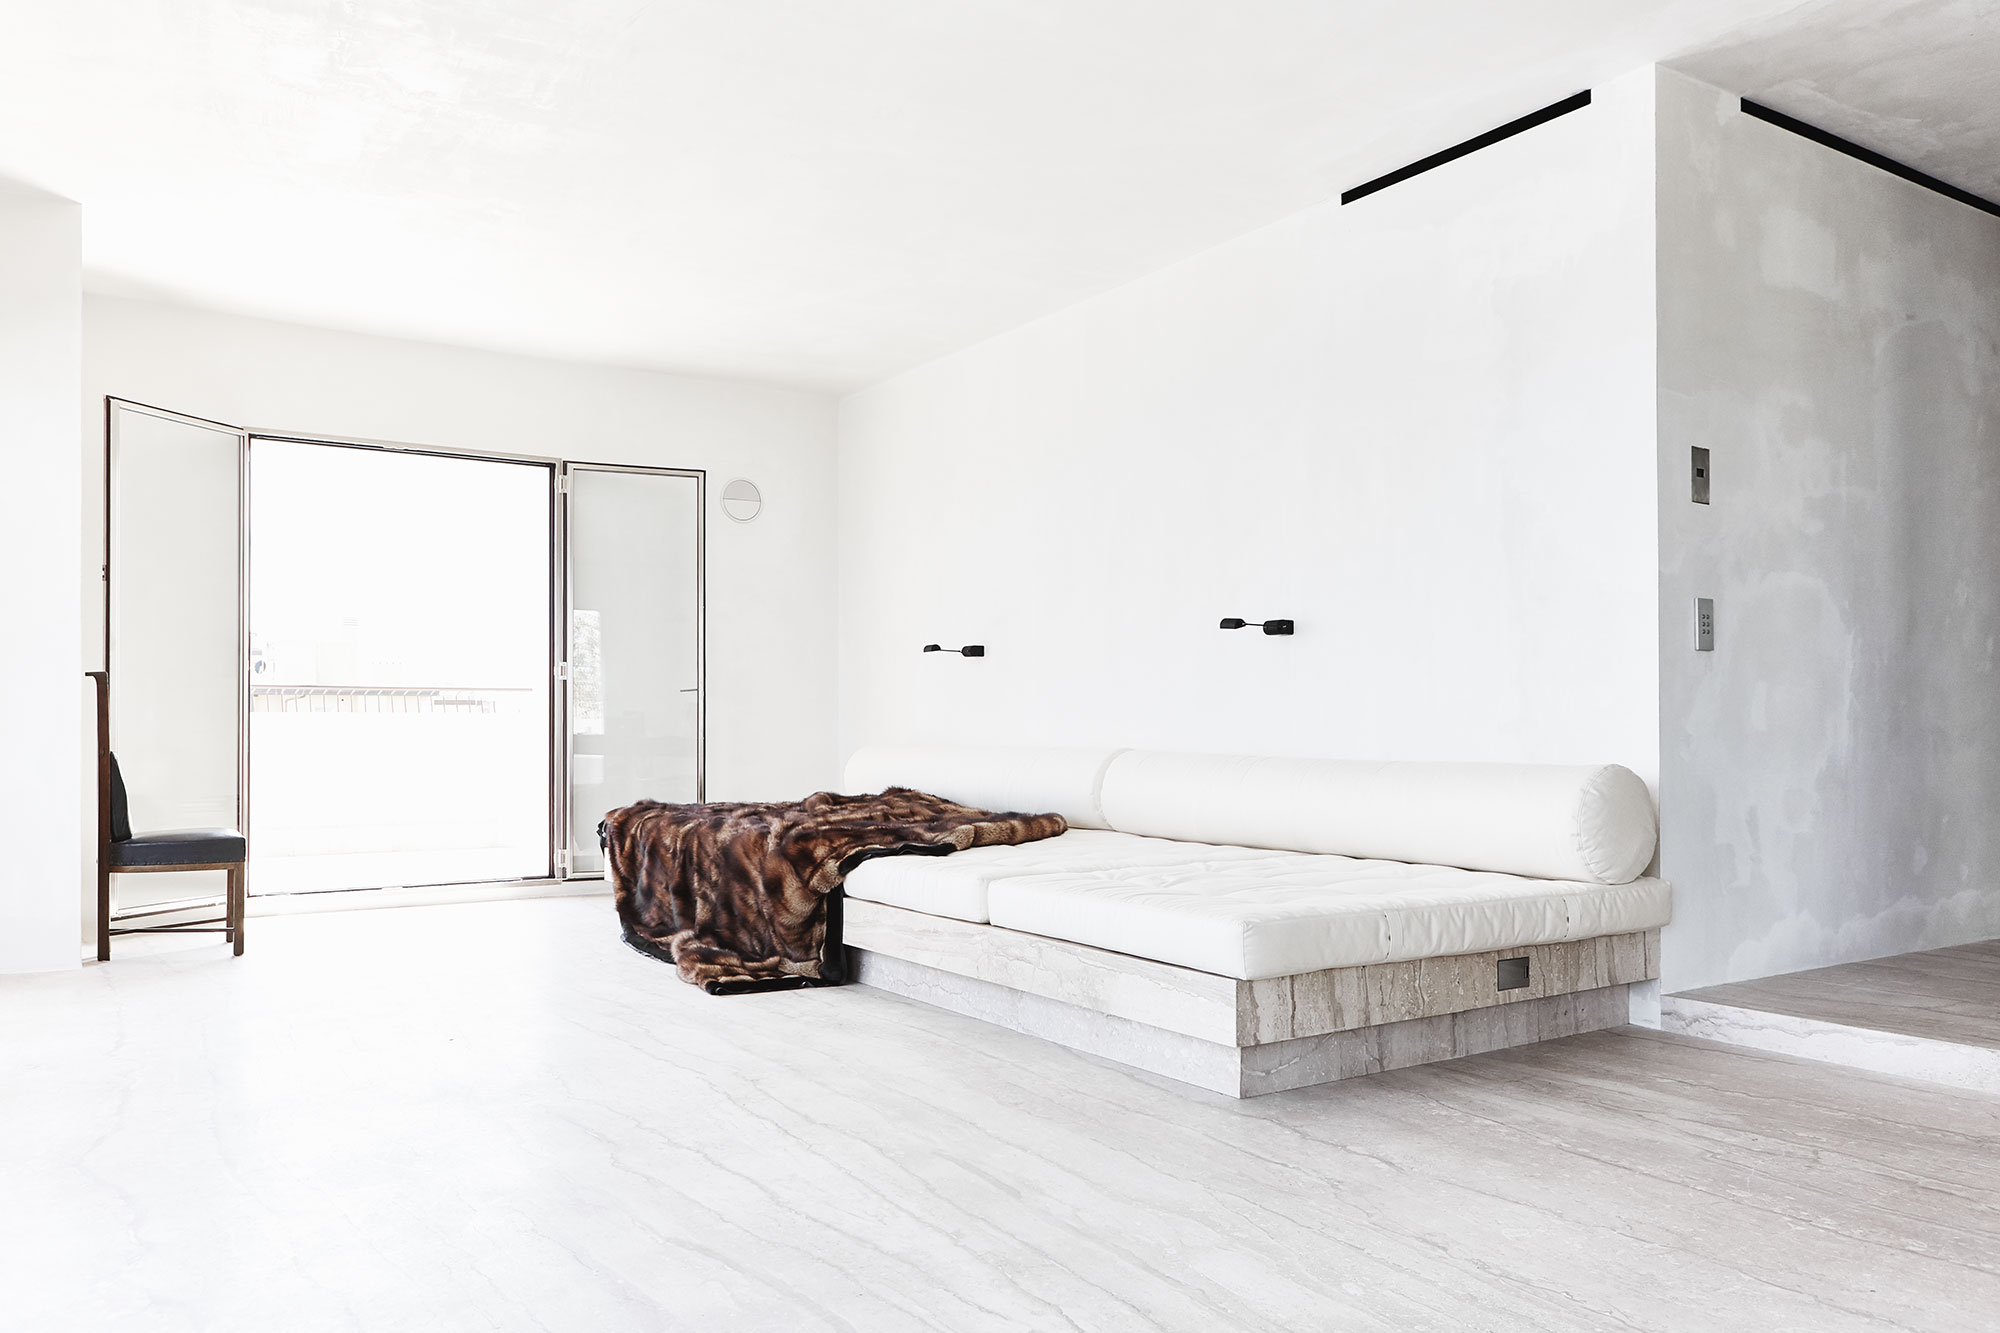 brutalism comfort and sleaze an interview with rick owens amuse. Black Bedroom Furniture Sets. Home Design Ideas